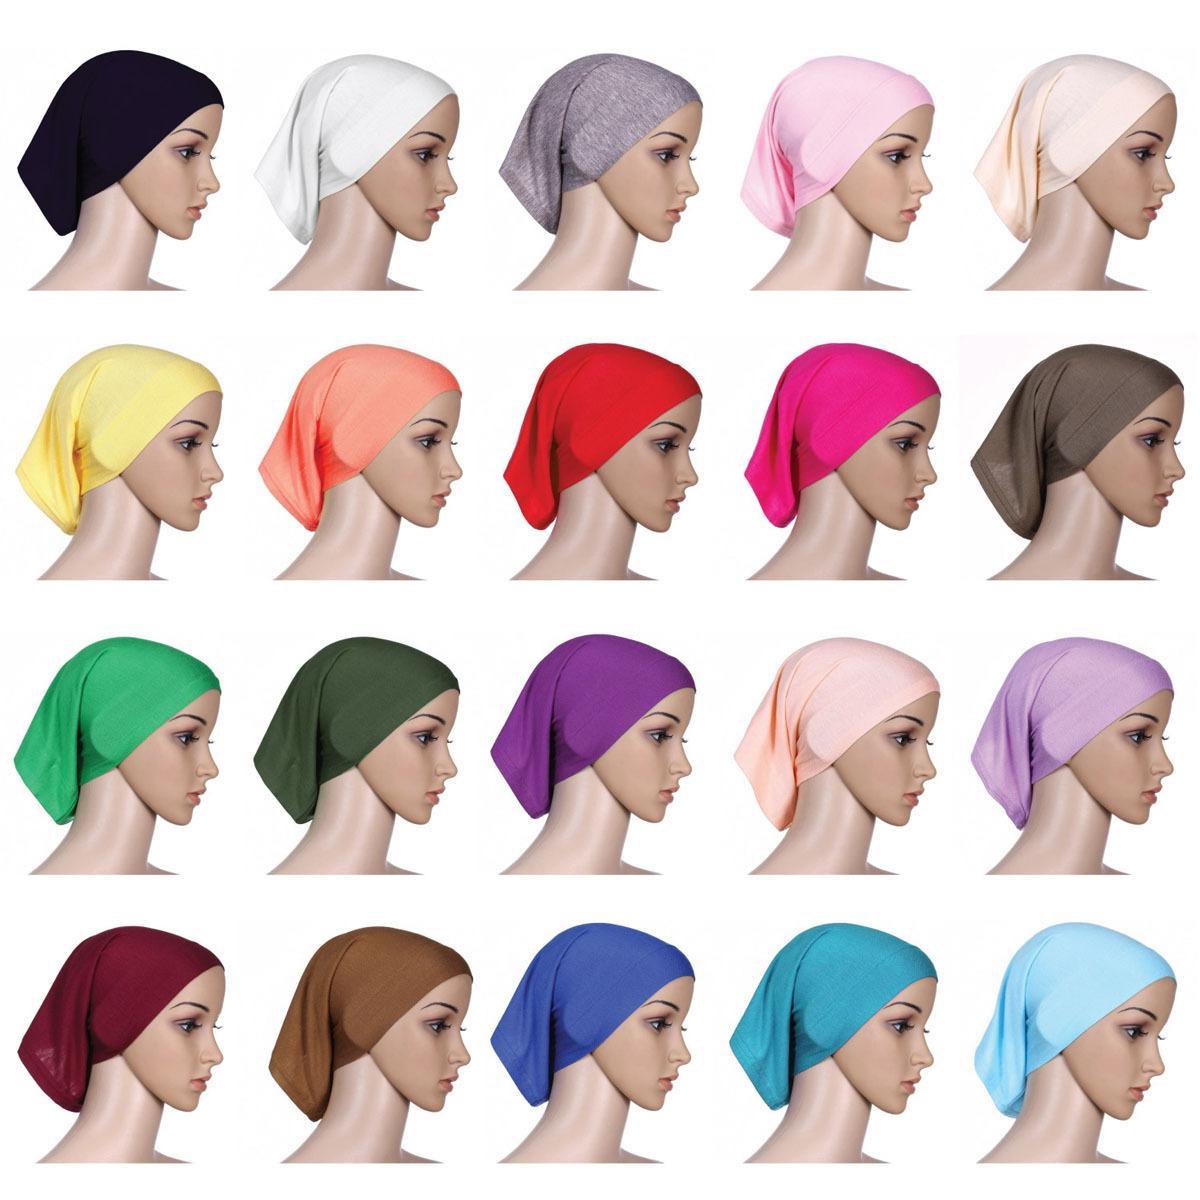 Musulmanes Inner HiJAB Cabeza de Pañuelo de cabeza Sombreros Sombreros Caliente Ninja Bufanda Ramadán Stretch Bonenet Caps 20 Colores KKA7531